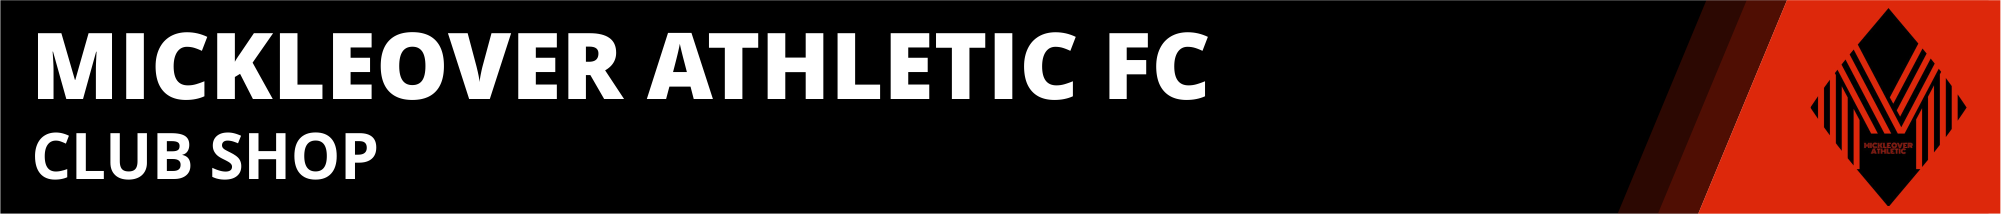 mickleover-athletic-fc-club-shop-banner.png